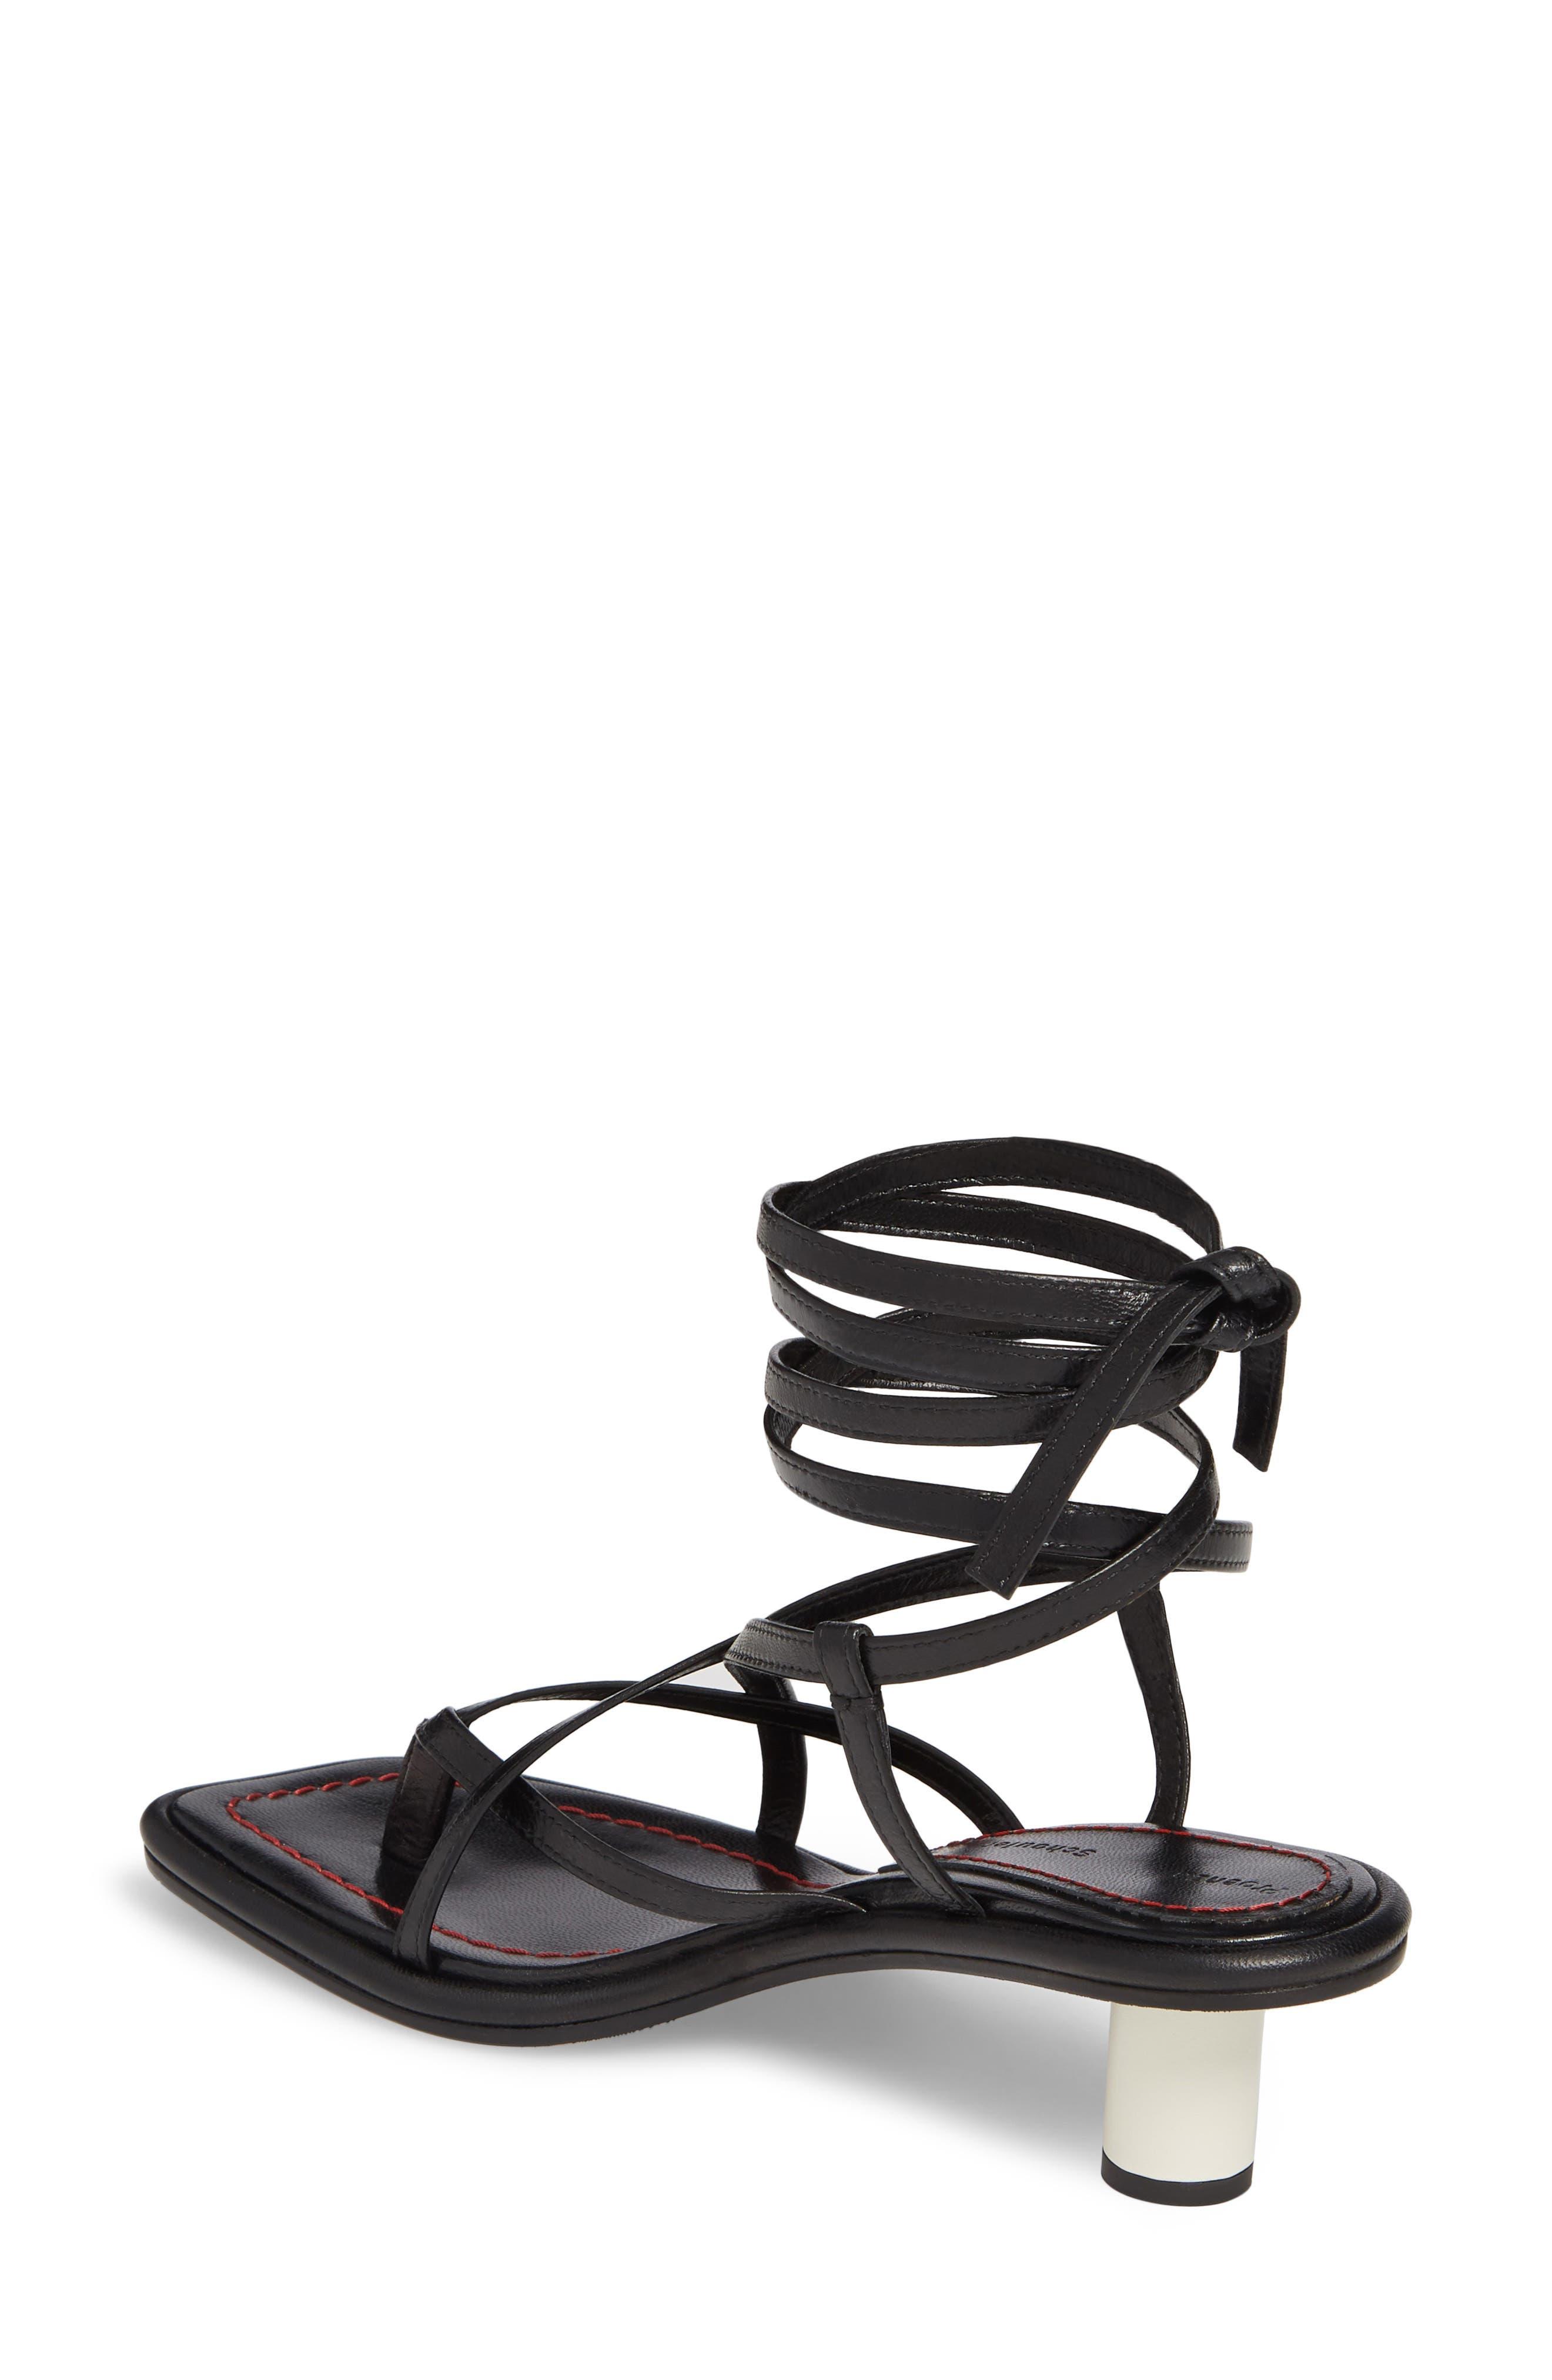 PROENZA SCHOULER, Wraparound Ankle Strap Sandal, Alternate thumbnail 2, color, BLACK